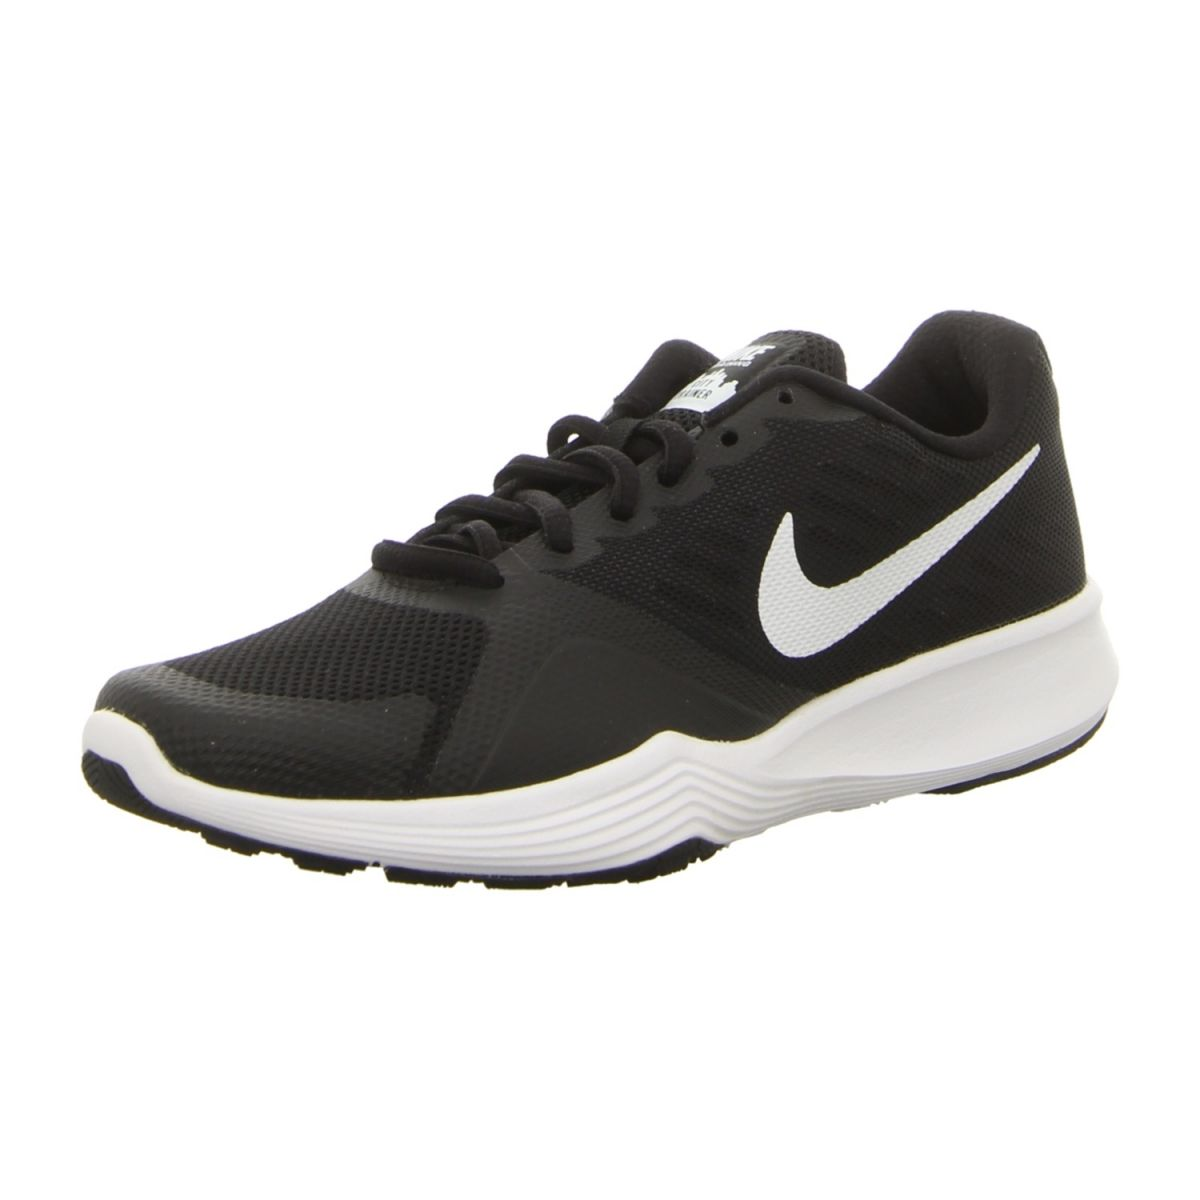 Nike WMNS City Trainer Sneaker schwarz